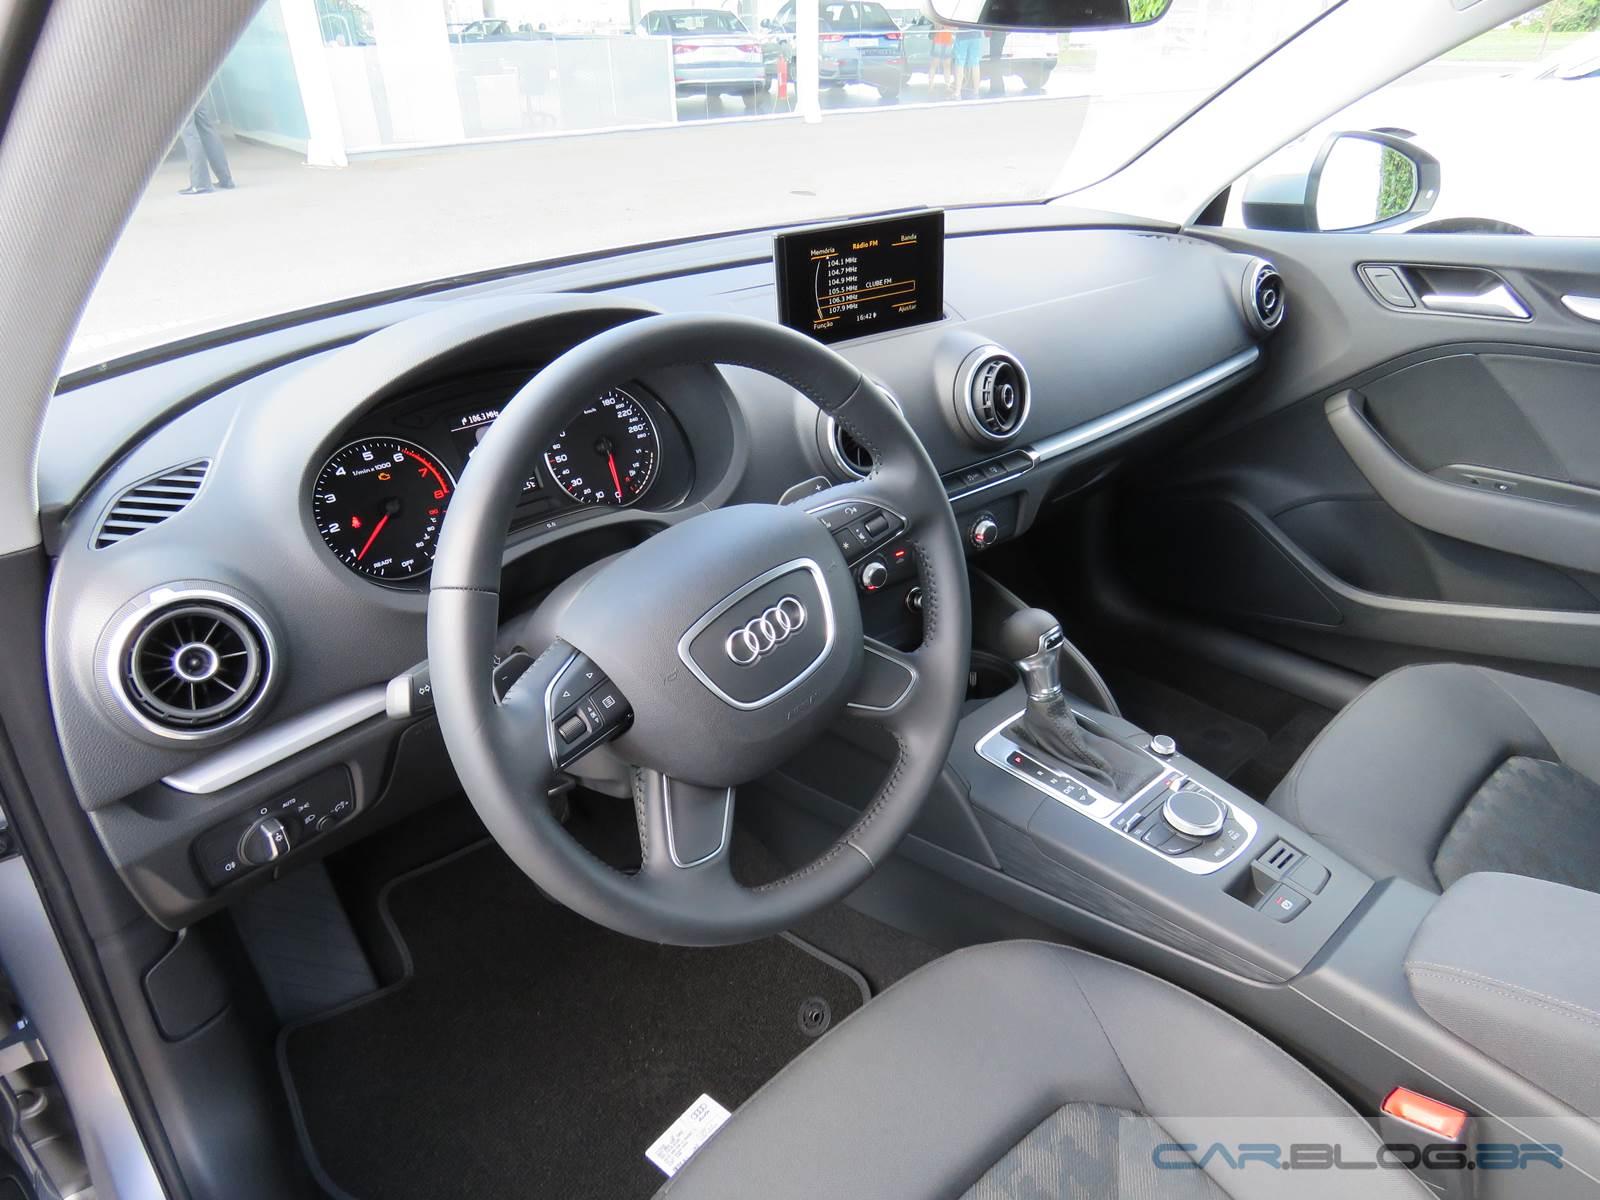 Novo Audi A3 Sedan 1.4 Flex Nacional - interior